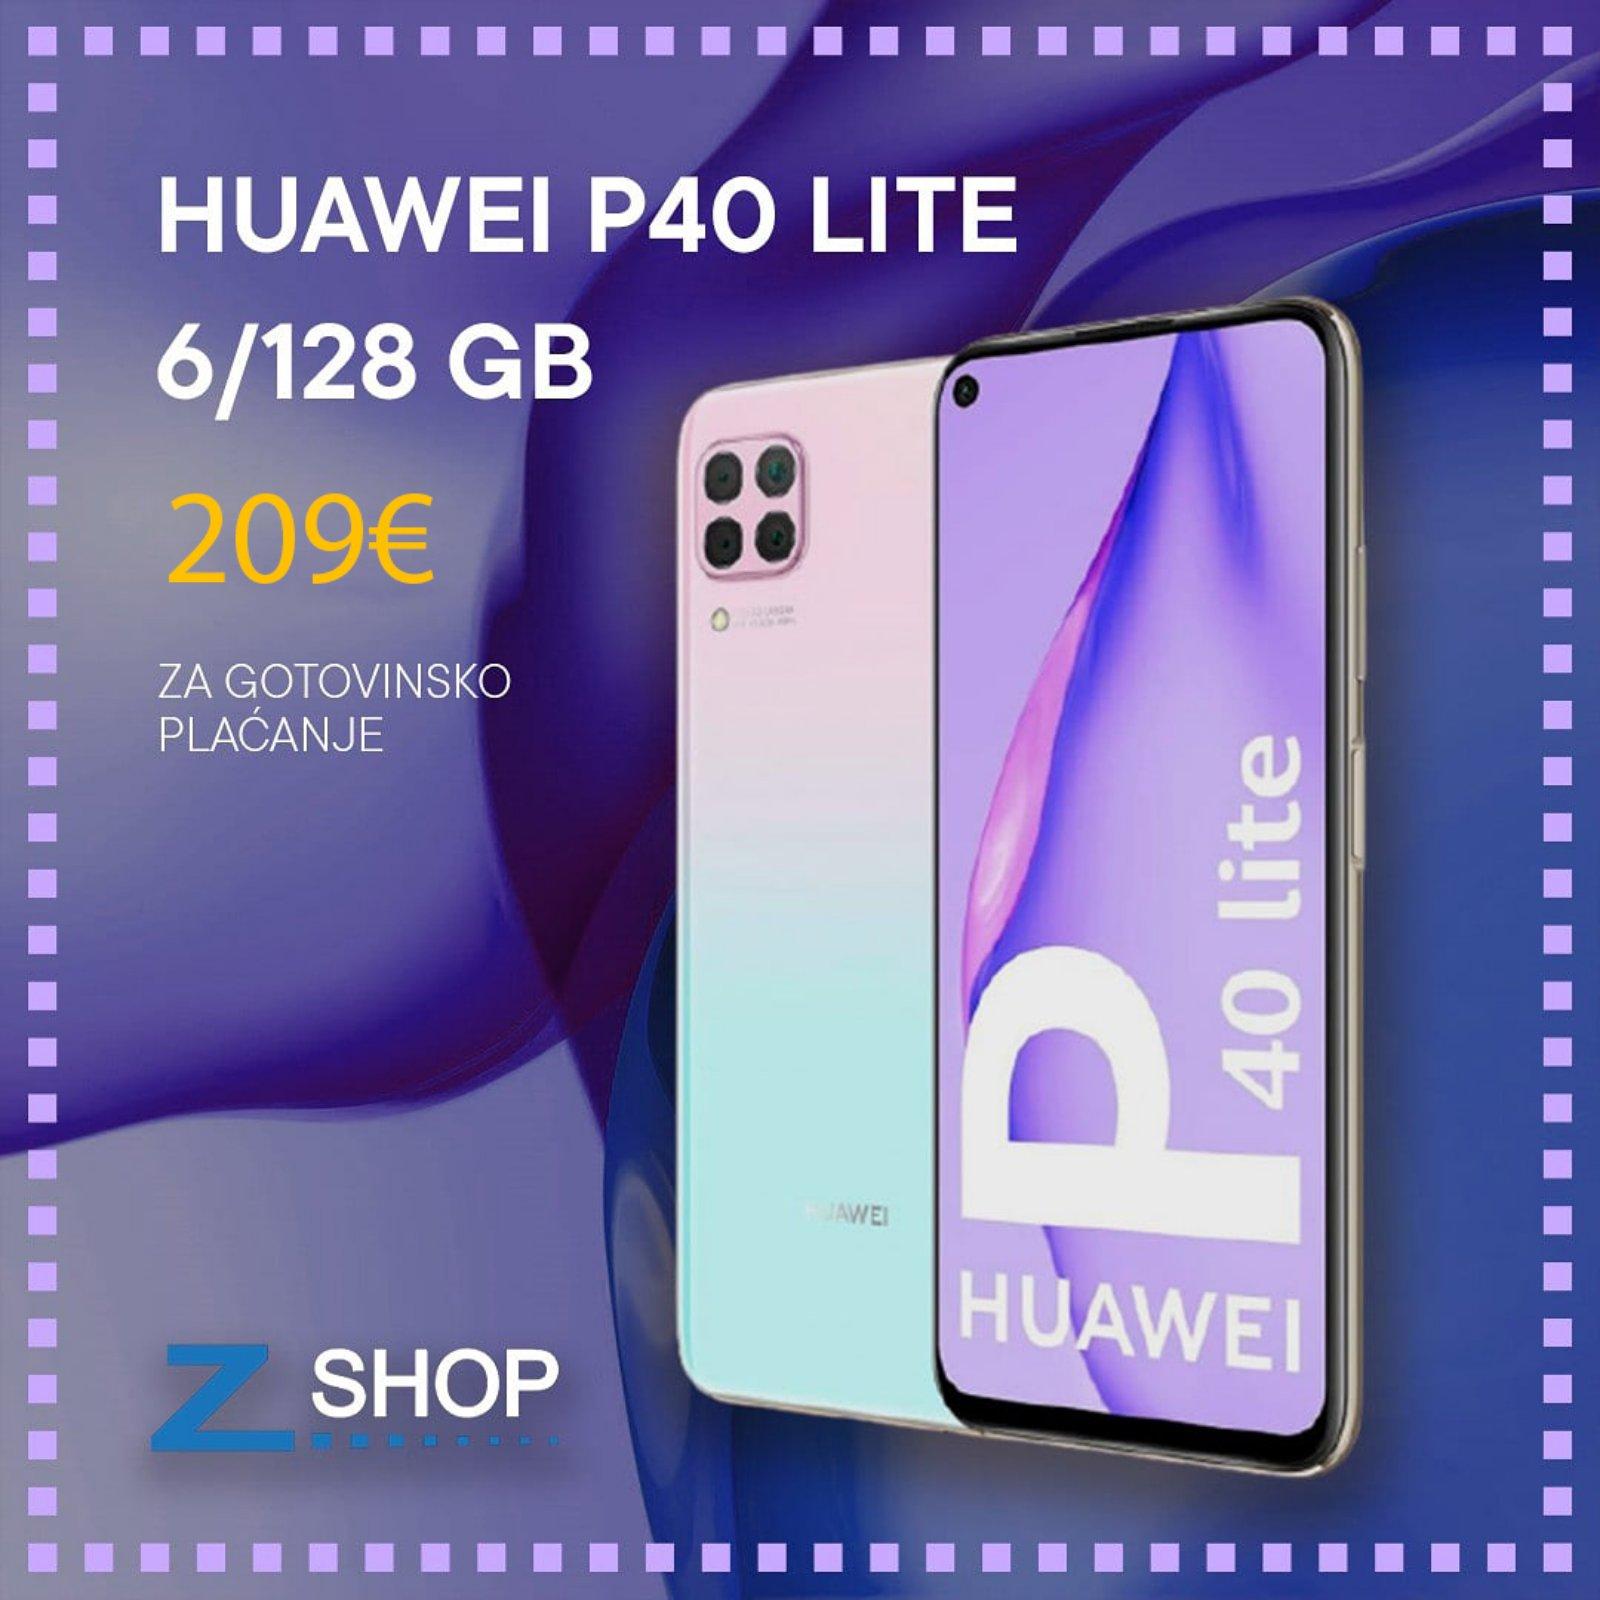 Huawei P40 Lite 6/128 GB